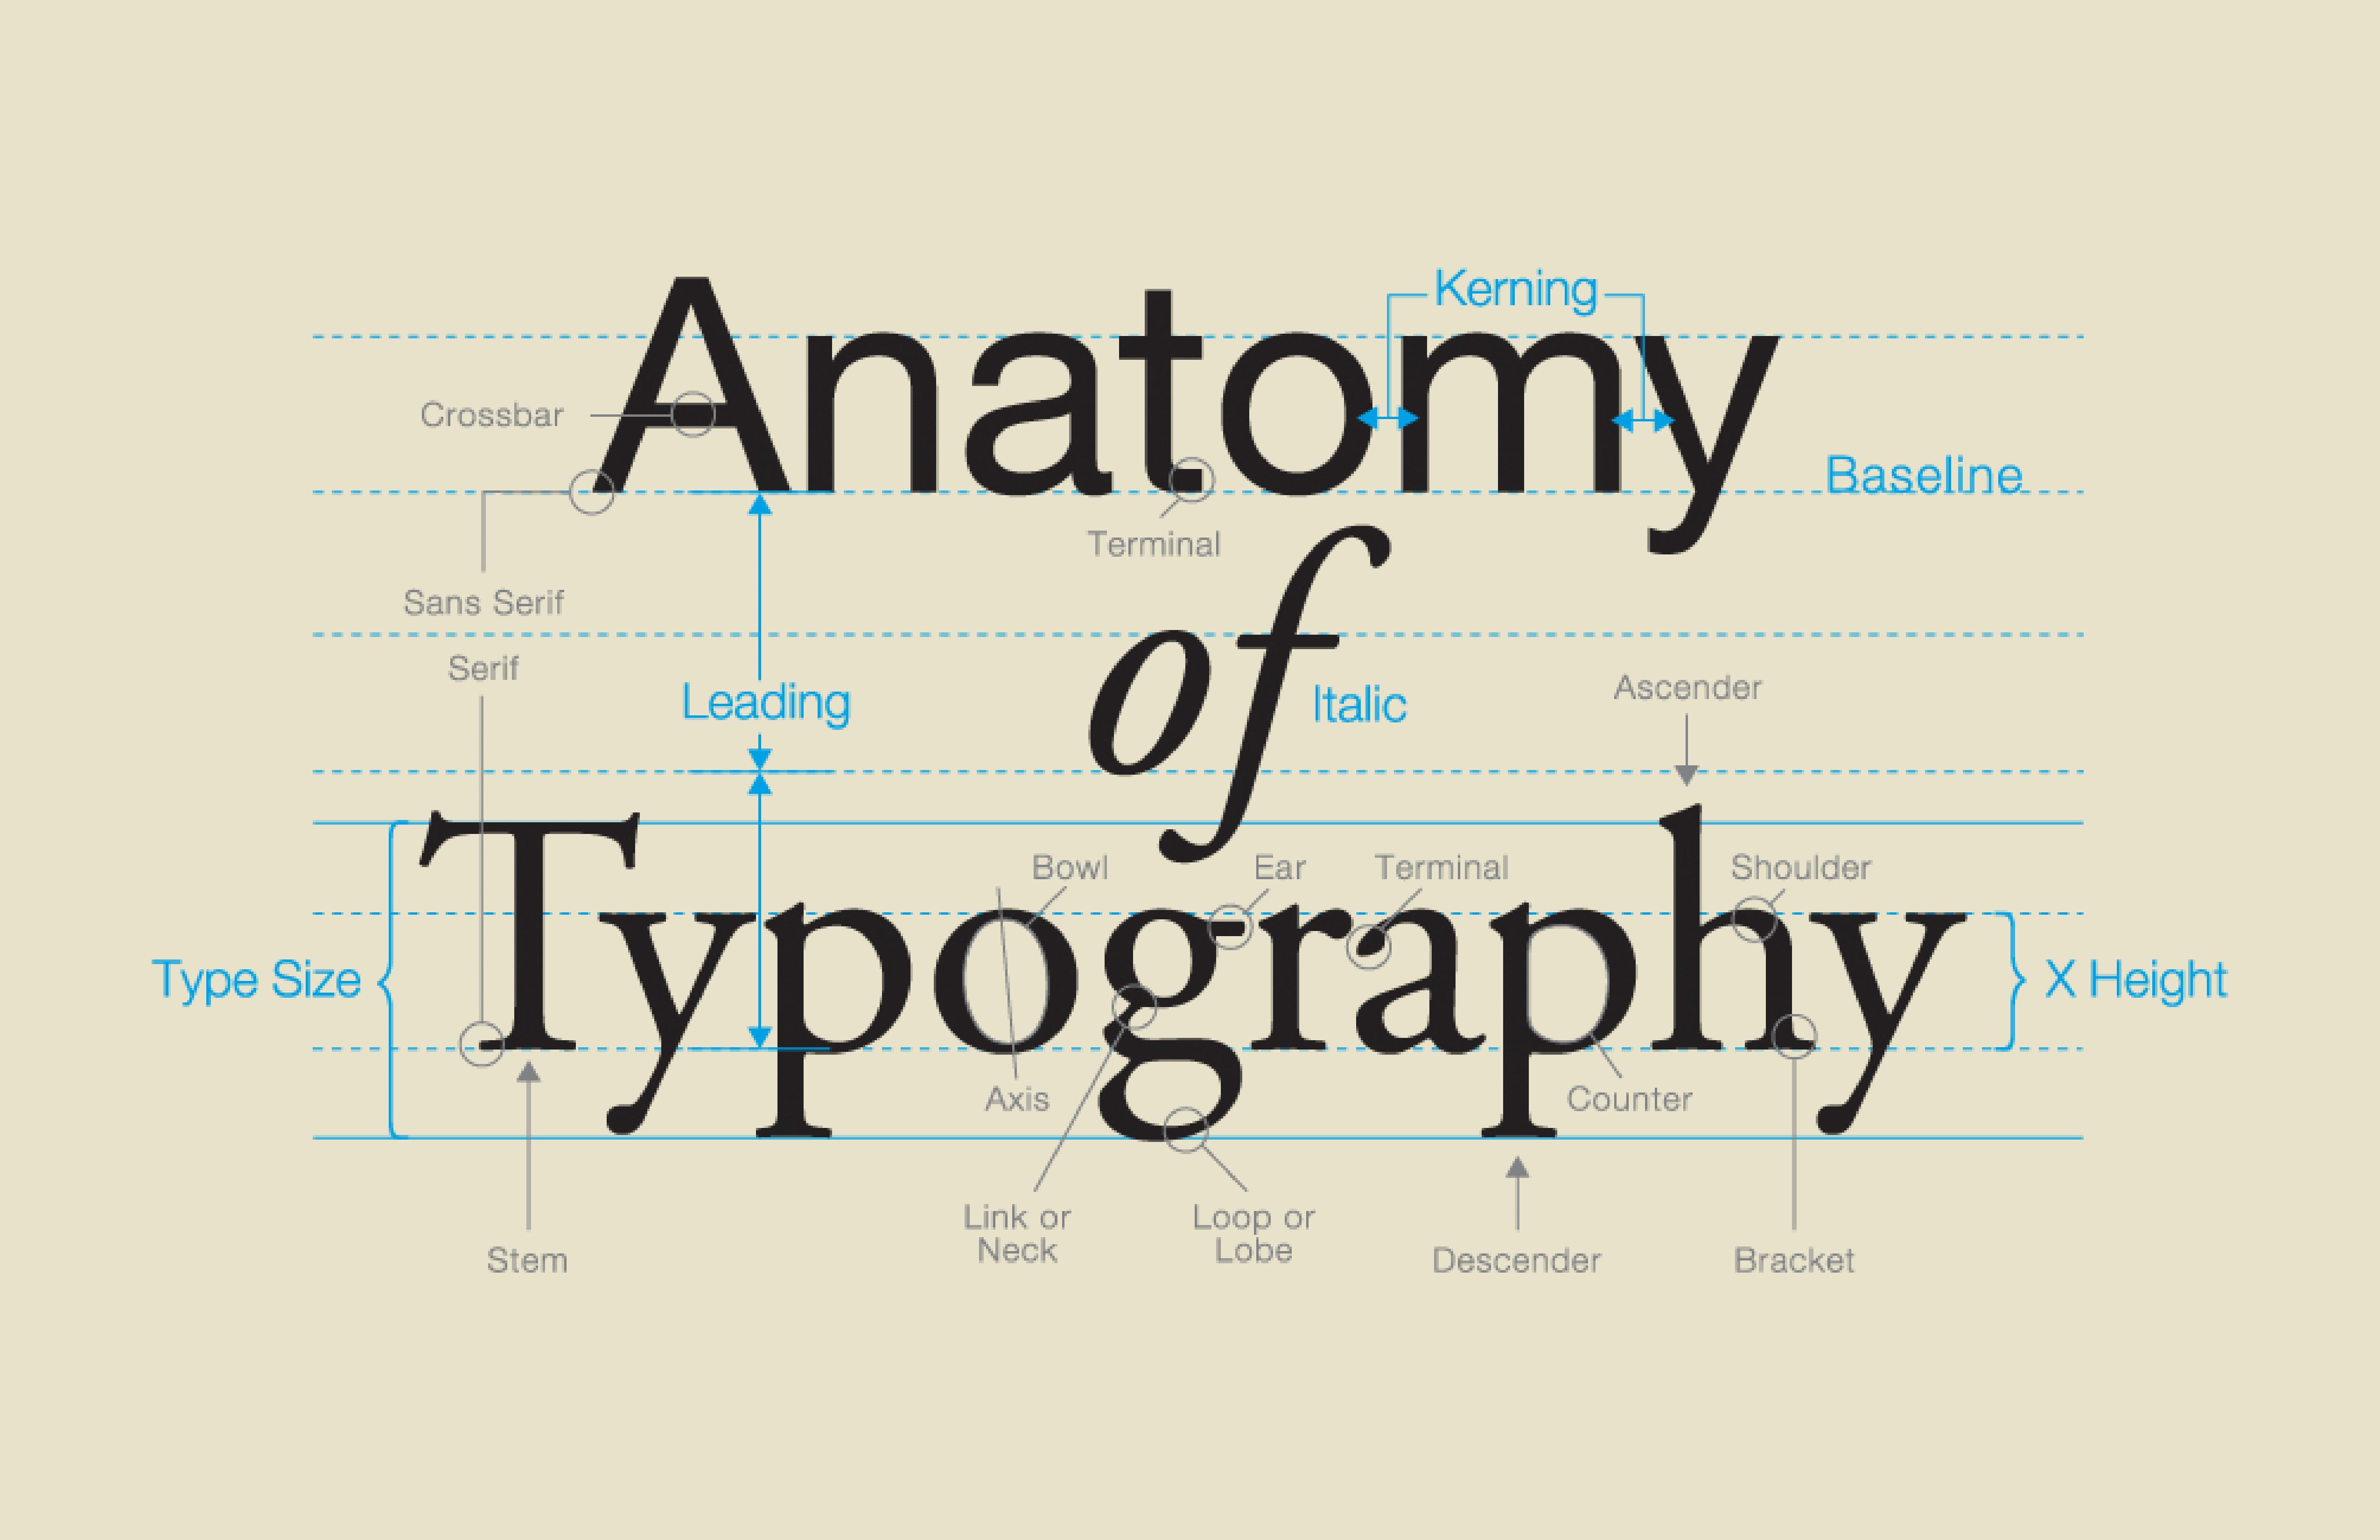 The Anatomy of Type   Anatomy, Type anatomy and Typography